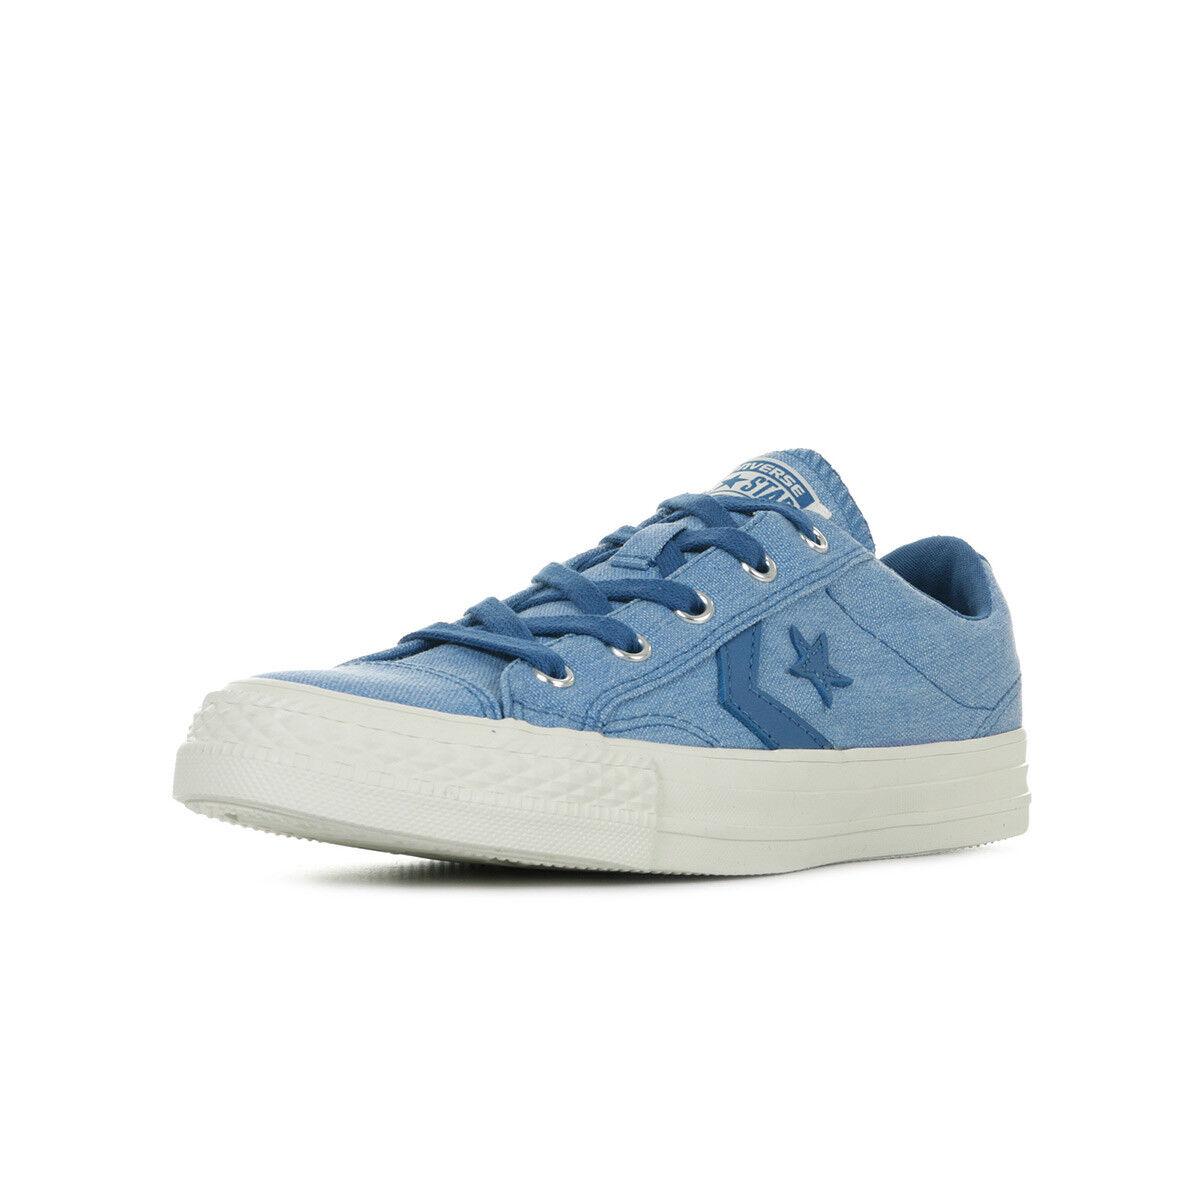 Chaussures Baskets Converse unisexe Star Player OX taille Bleu Bleue Textile